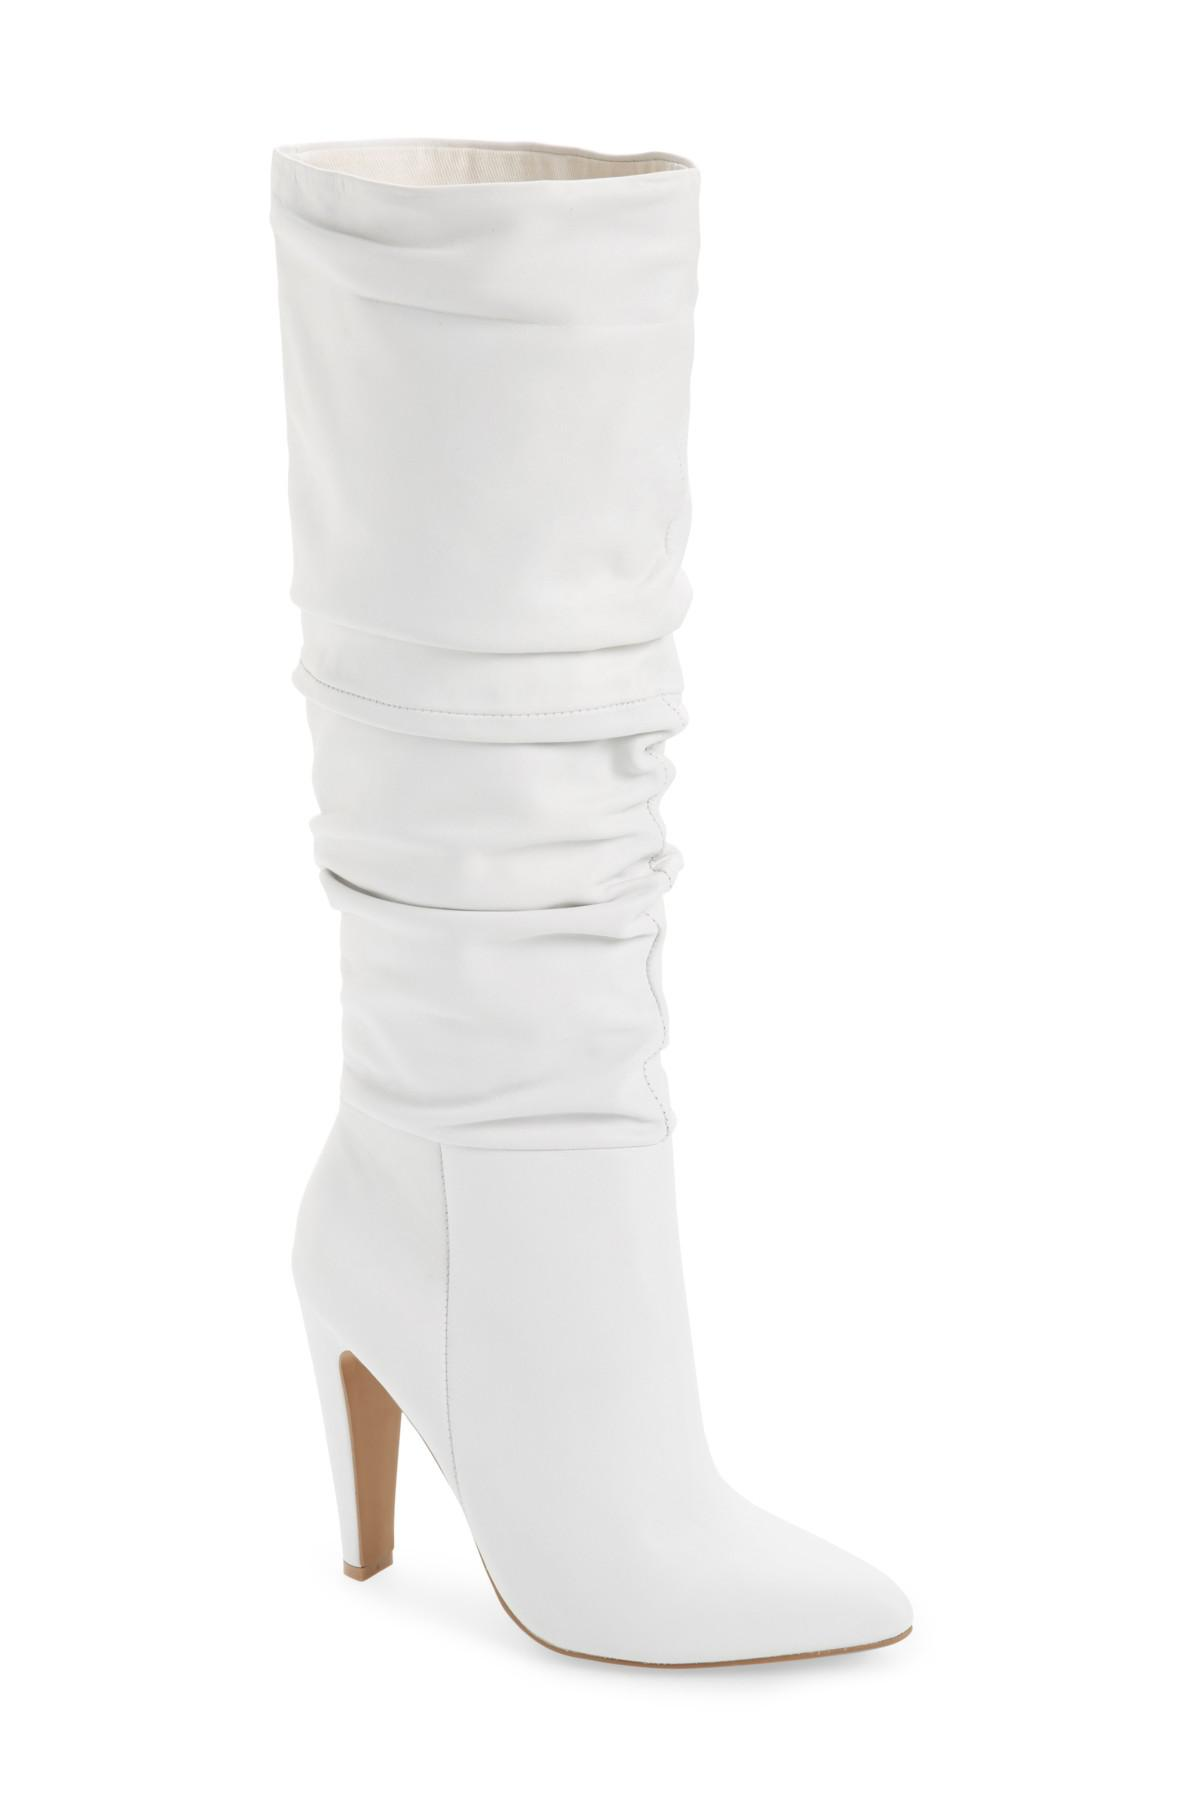 d4ec742515d Steve Madden Carrie Slouchy Boot in White - Lyst